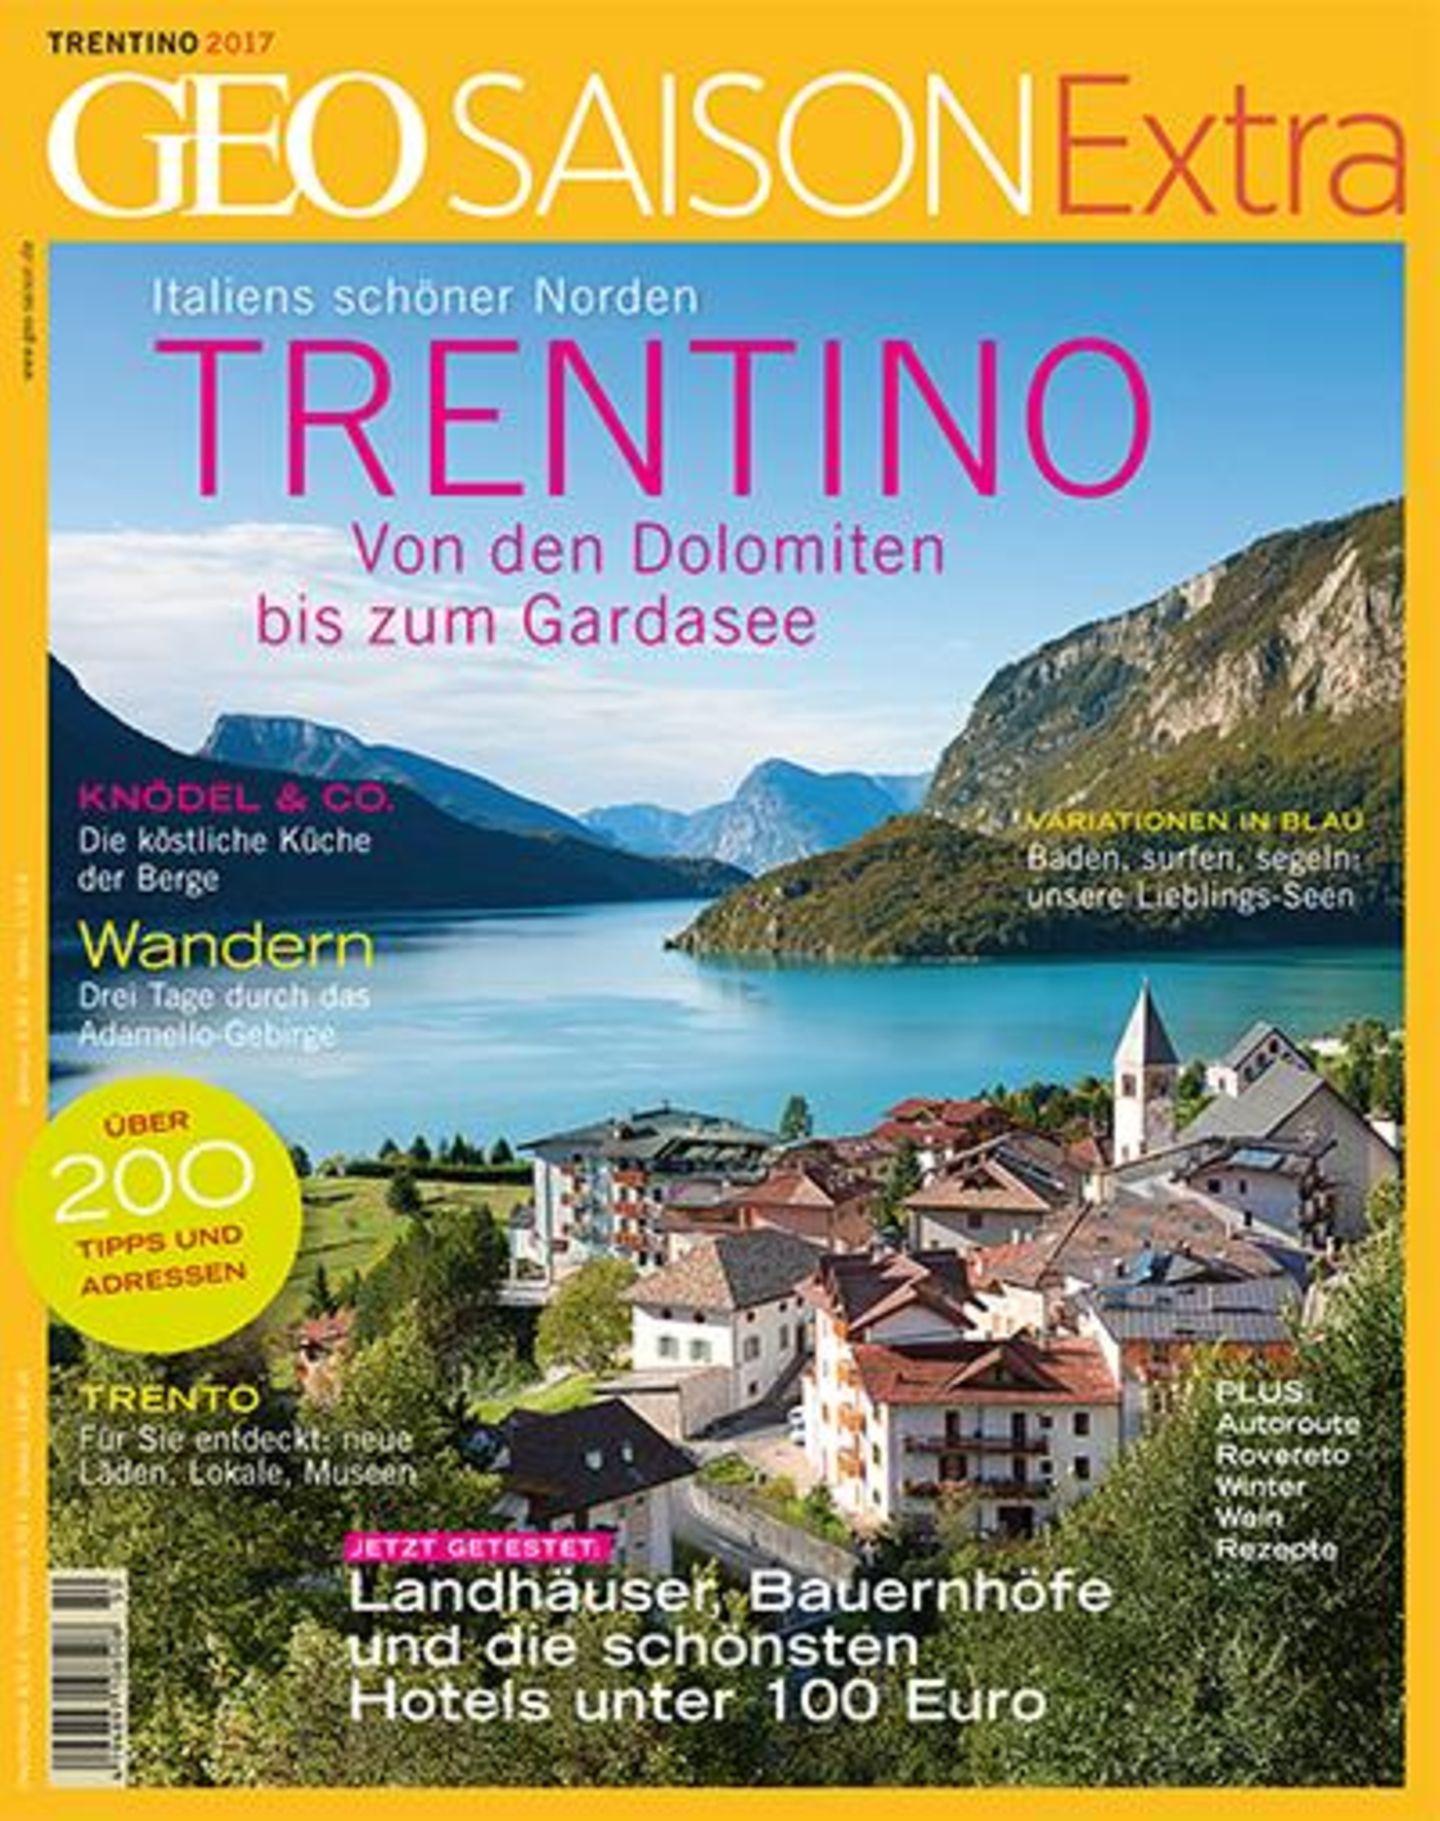 GEO Saison Extra - Trentino